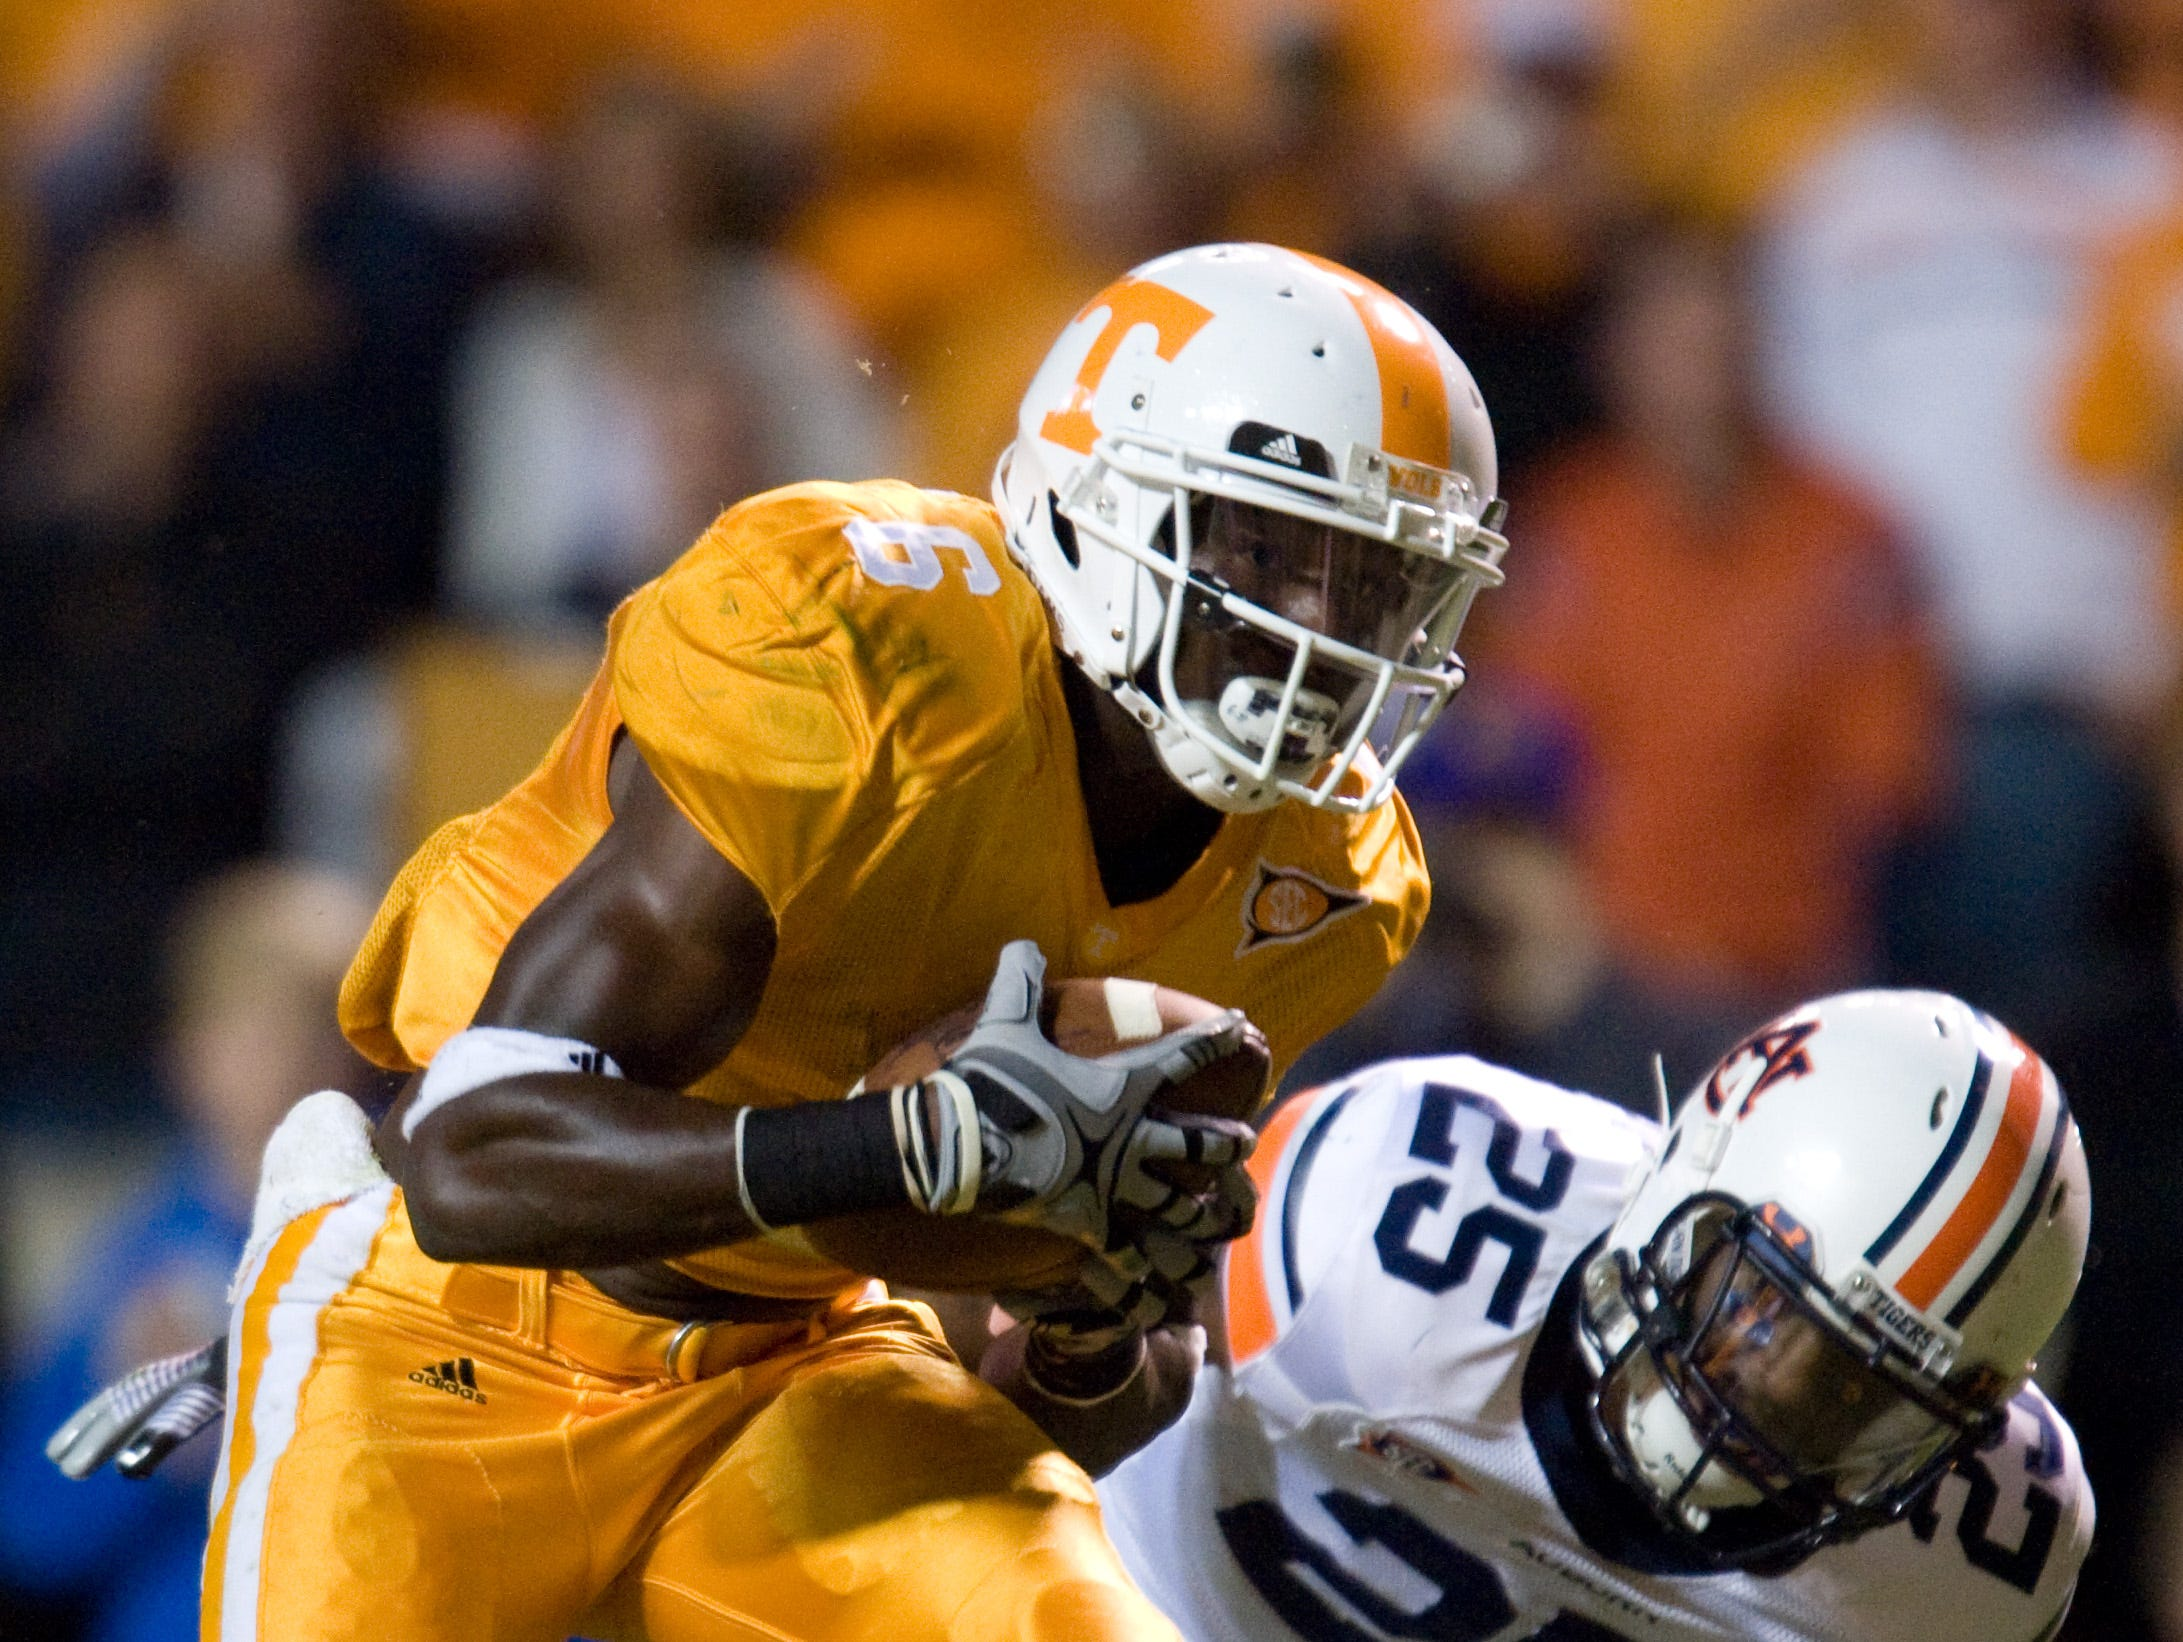 Tennessee wide receiver Denarius Moore (6) catches a pass in front of Auburn cornerback Daren Bates (25)on Saturday, Oct. 3, 2009 at Neyland Stadium.